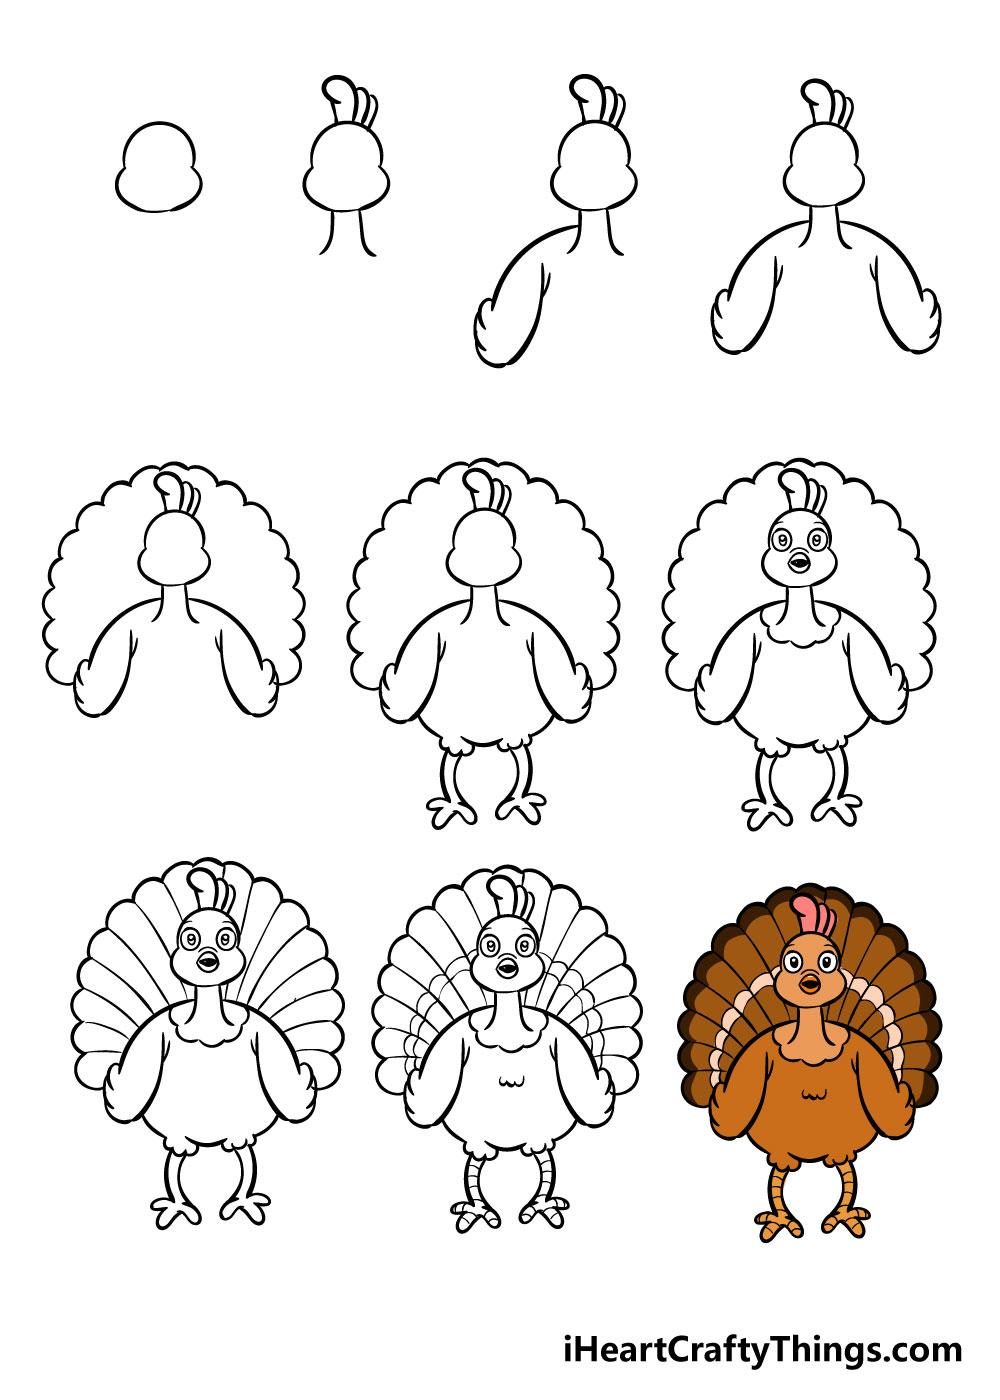 how to draw turkey in 10 steps